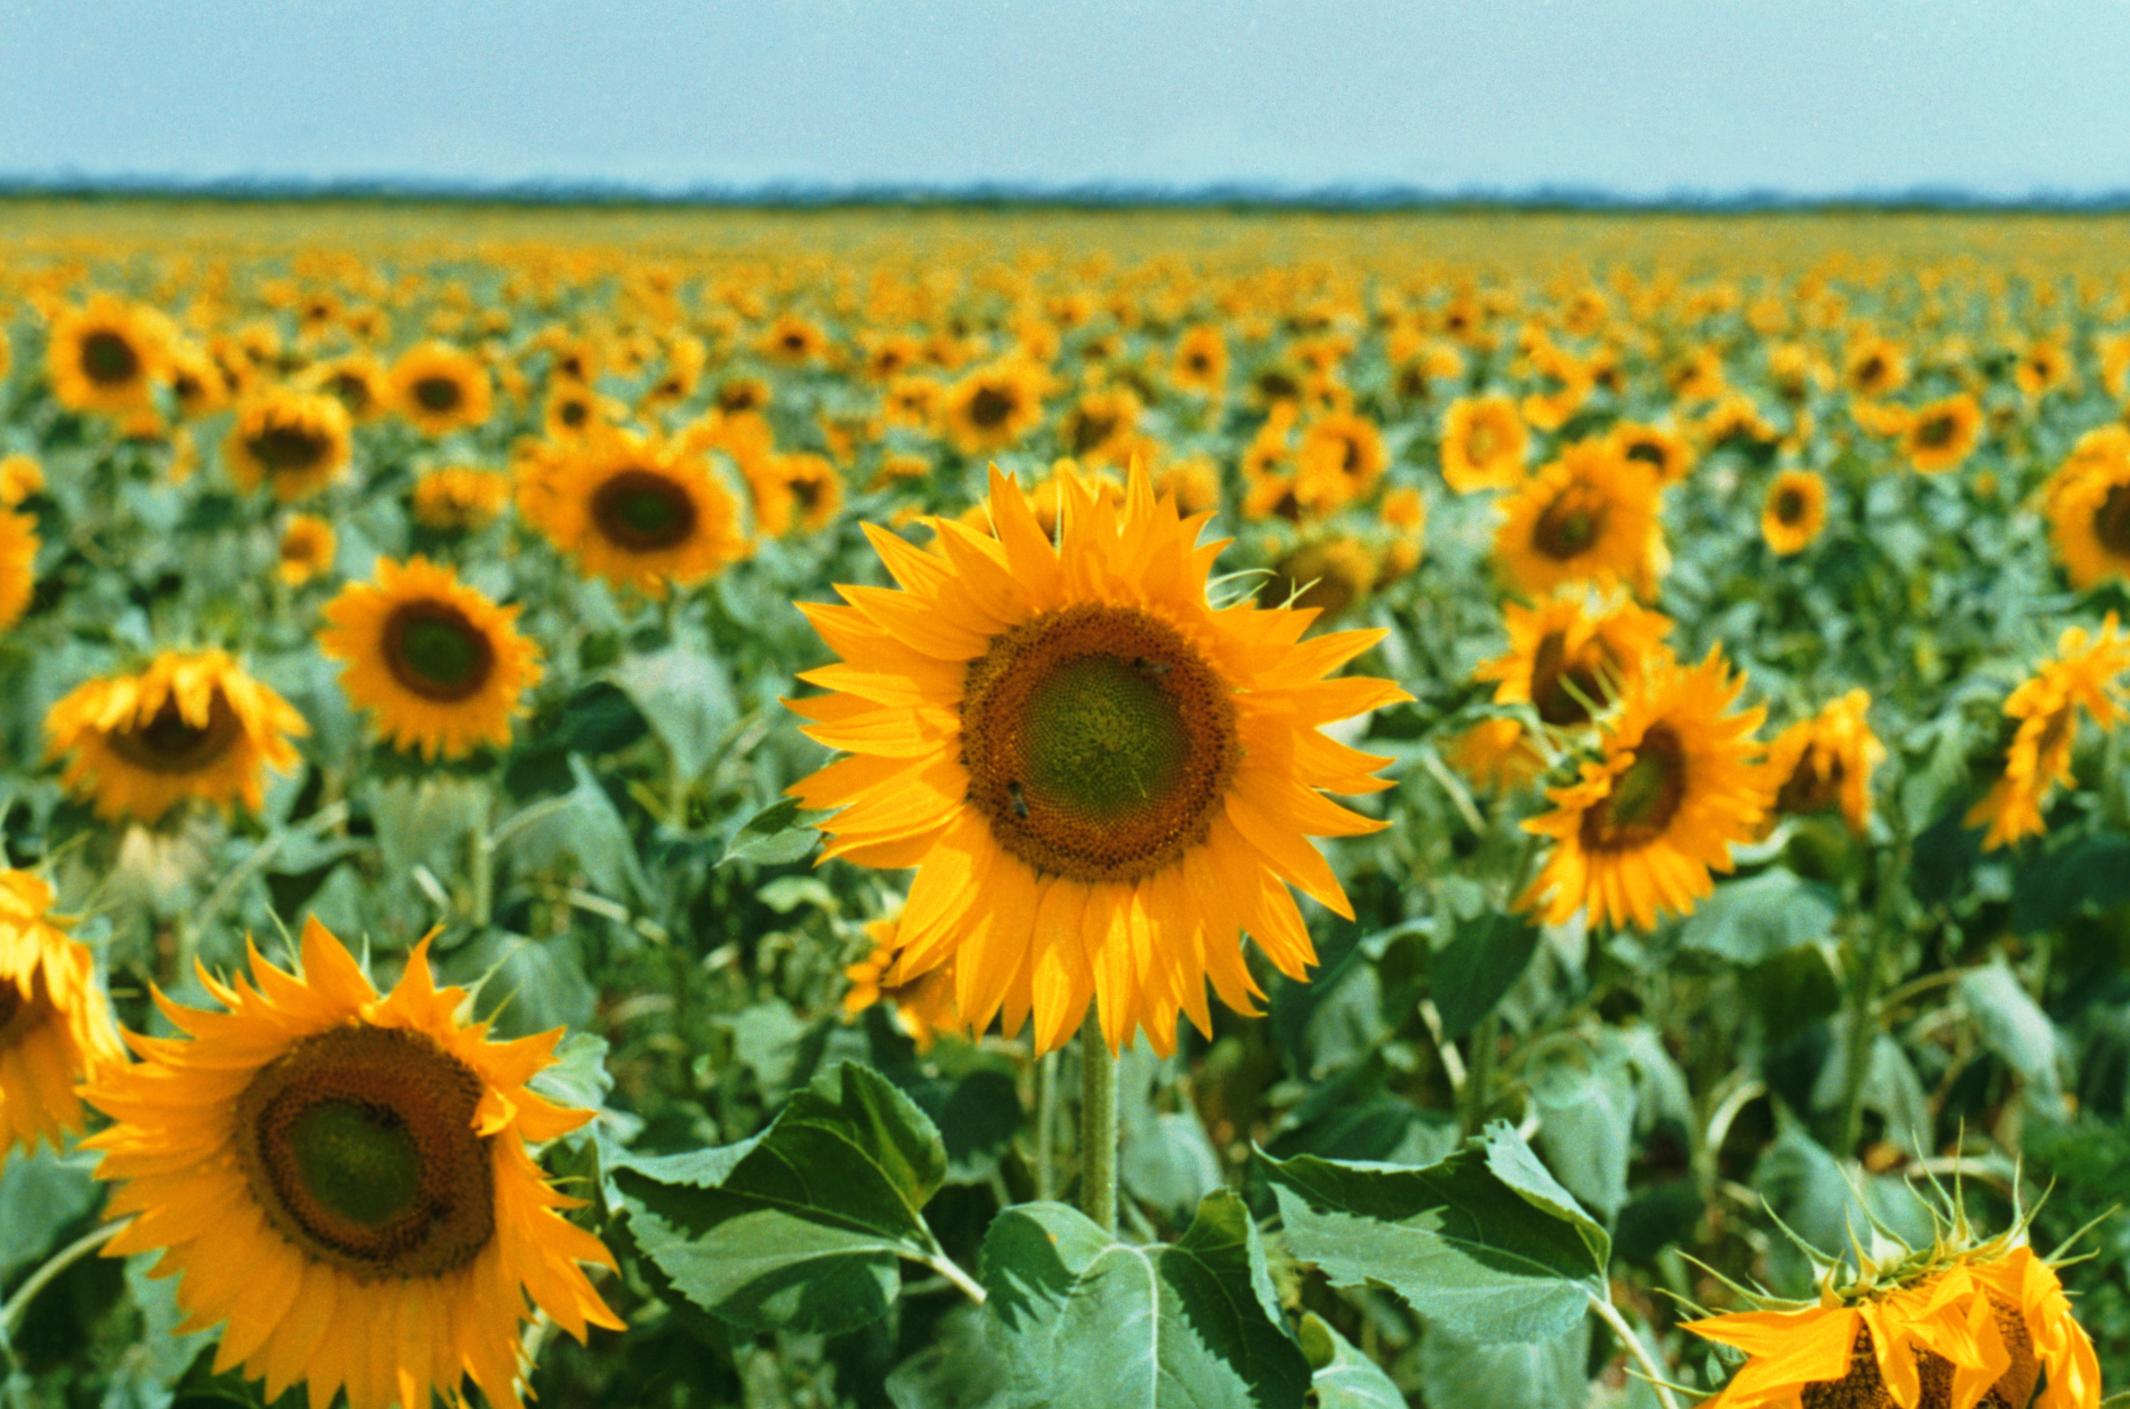 Flowers That Turn Toward the Sun